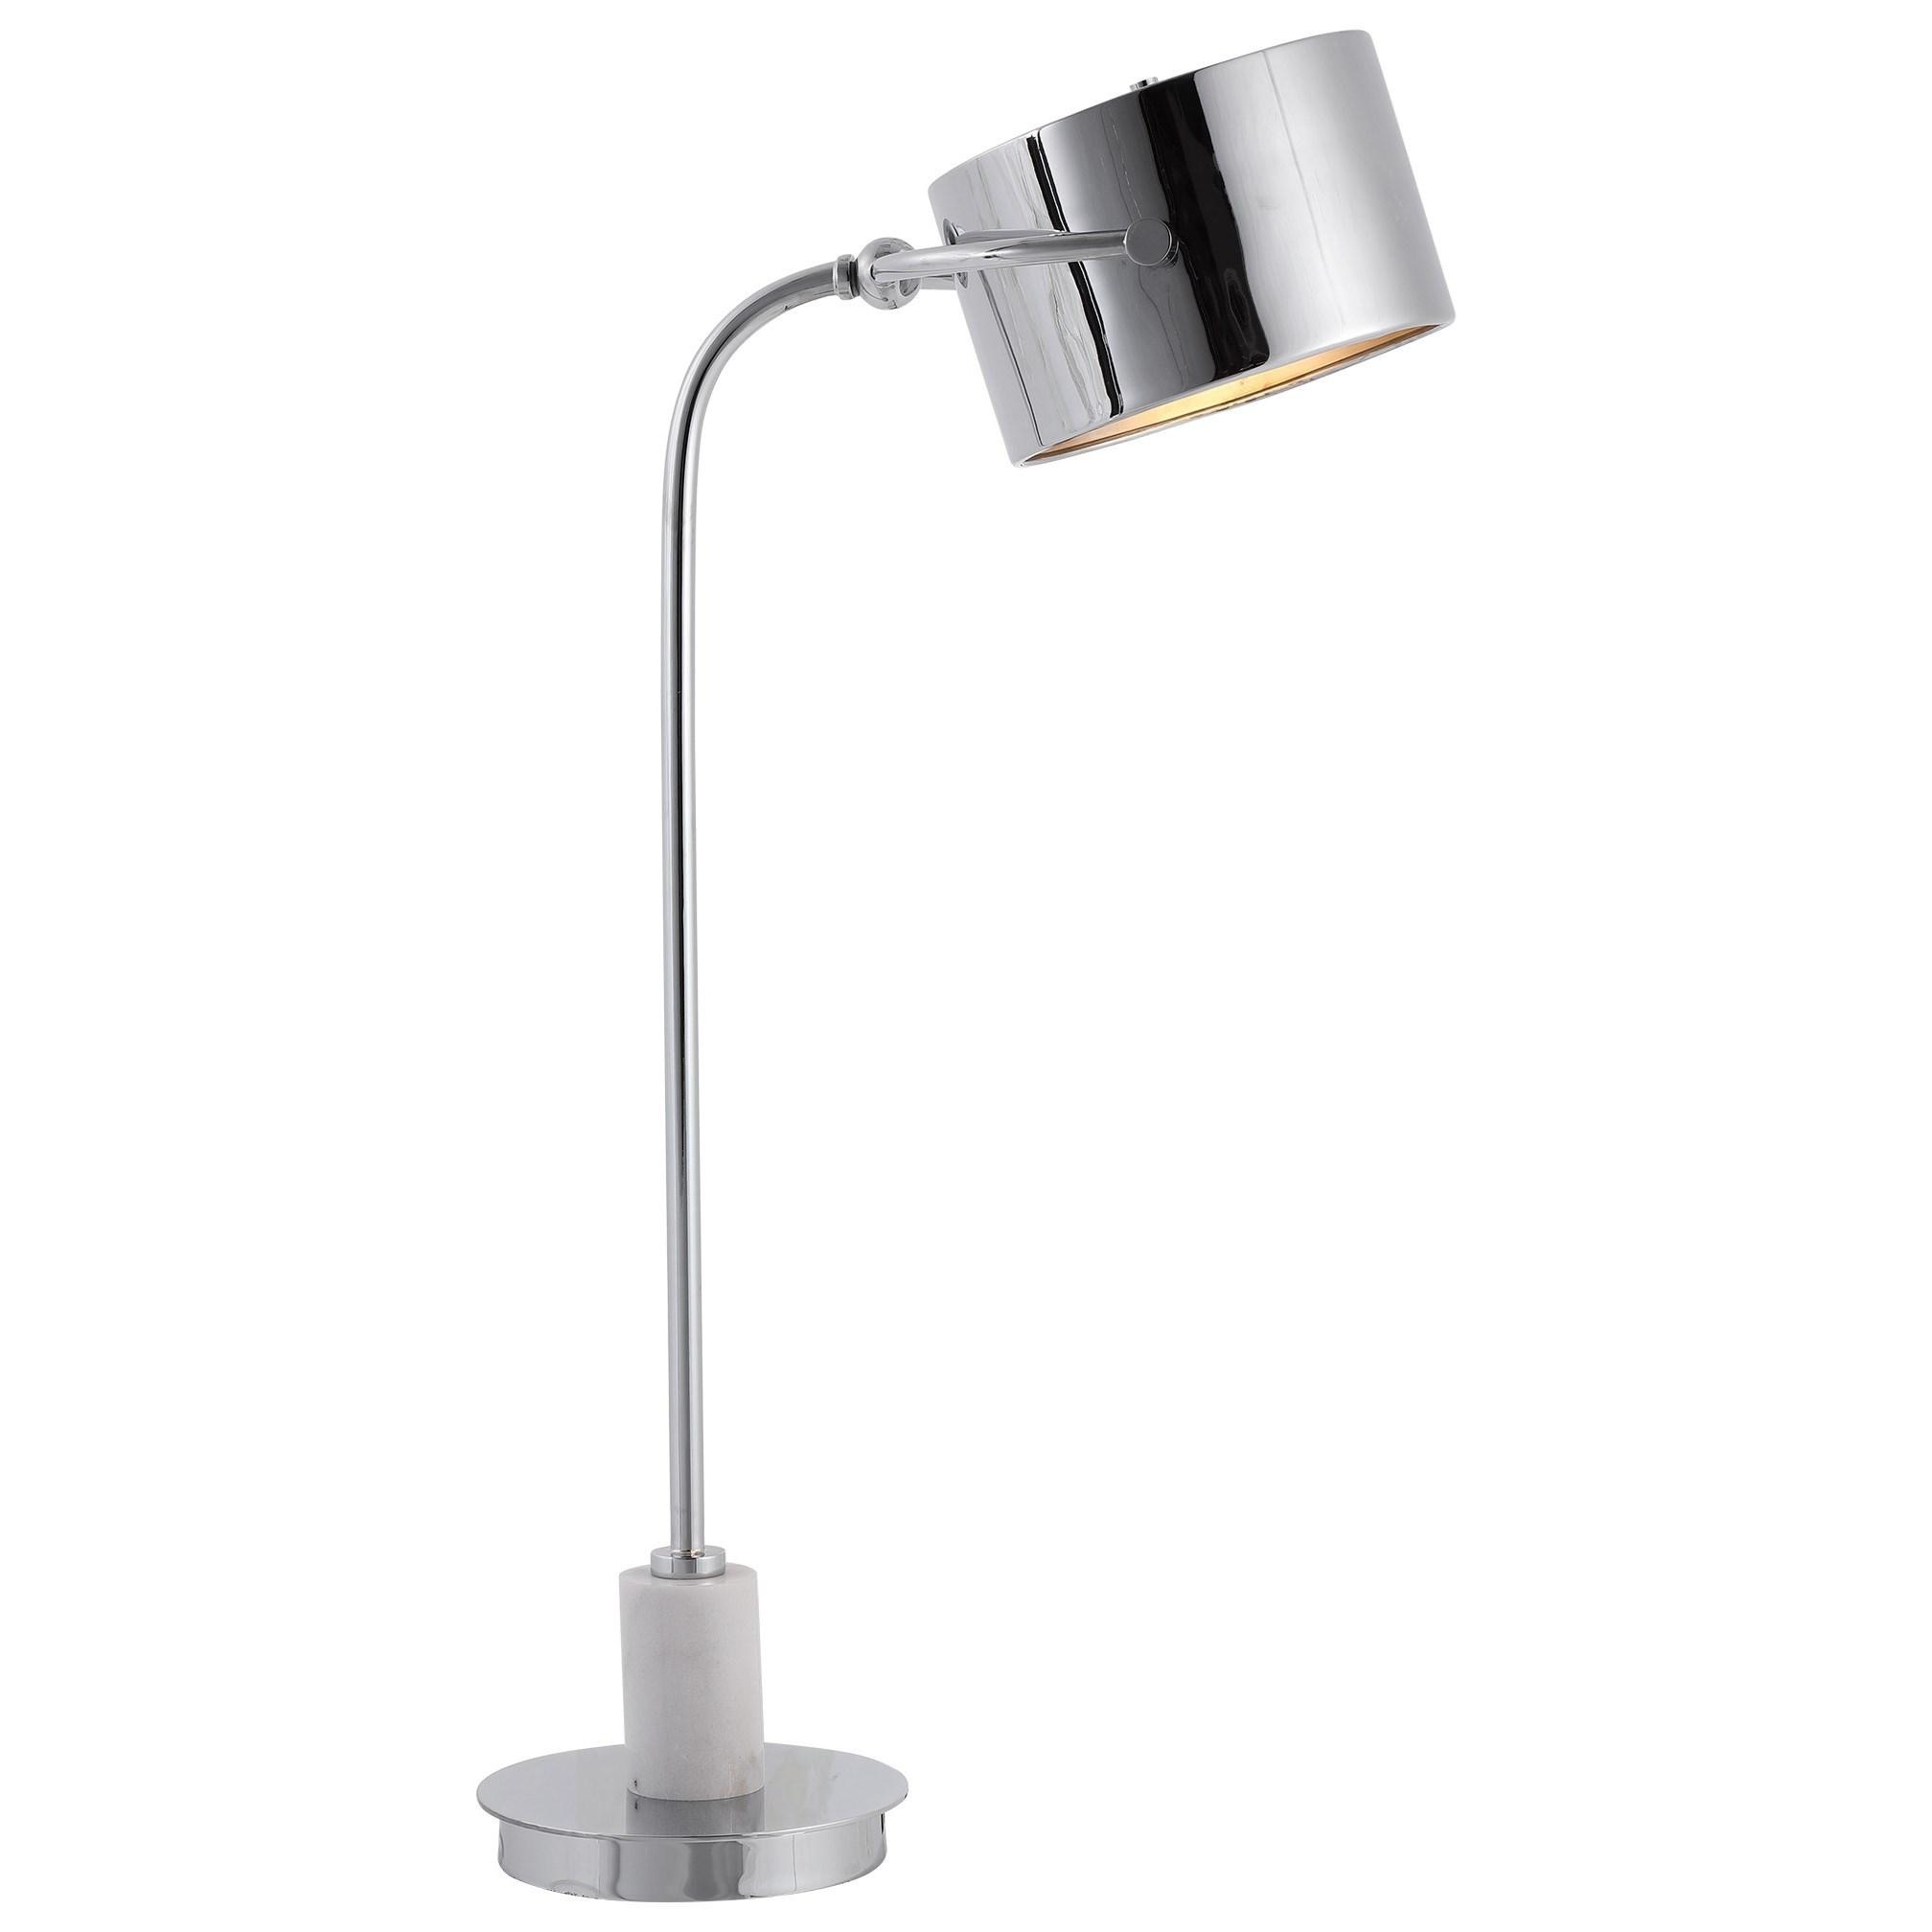 Desk Lamps Mendel Contemporary Desk Lamp by Uttermost at Mueller Furniture